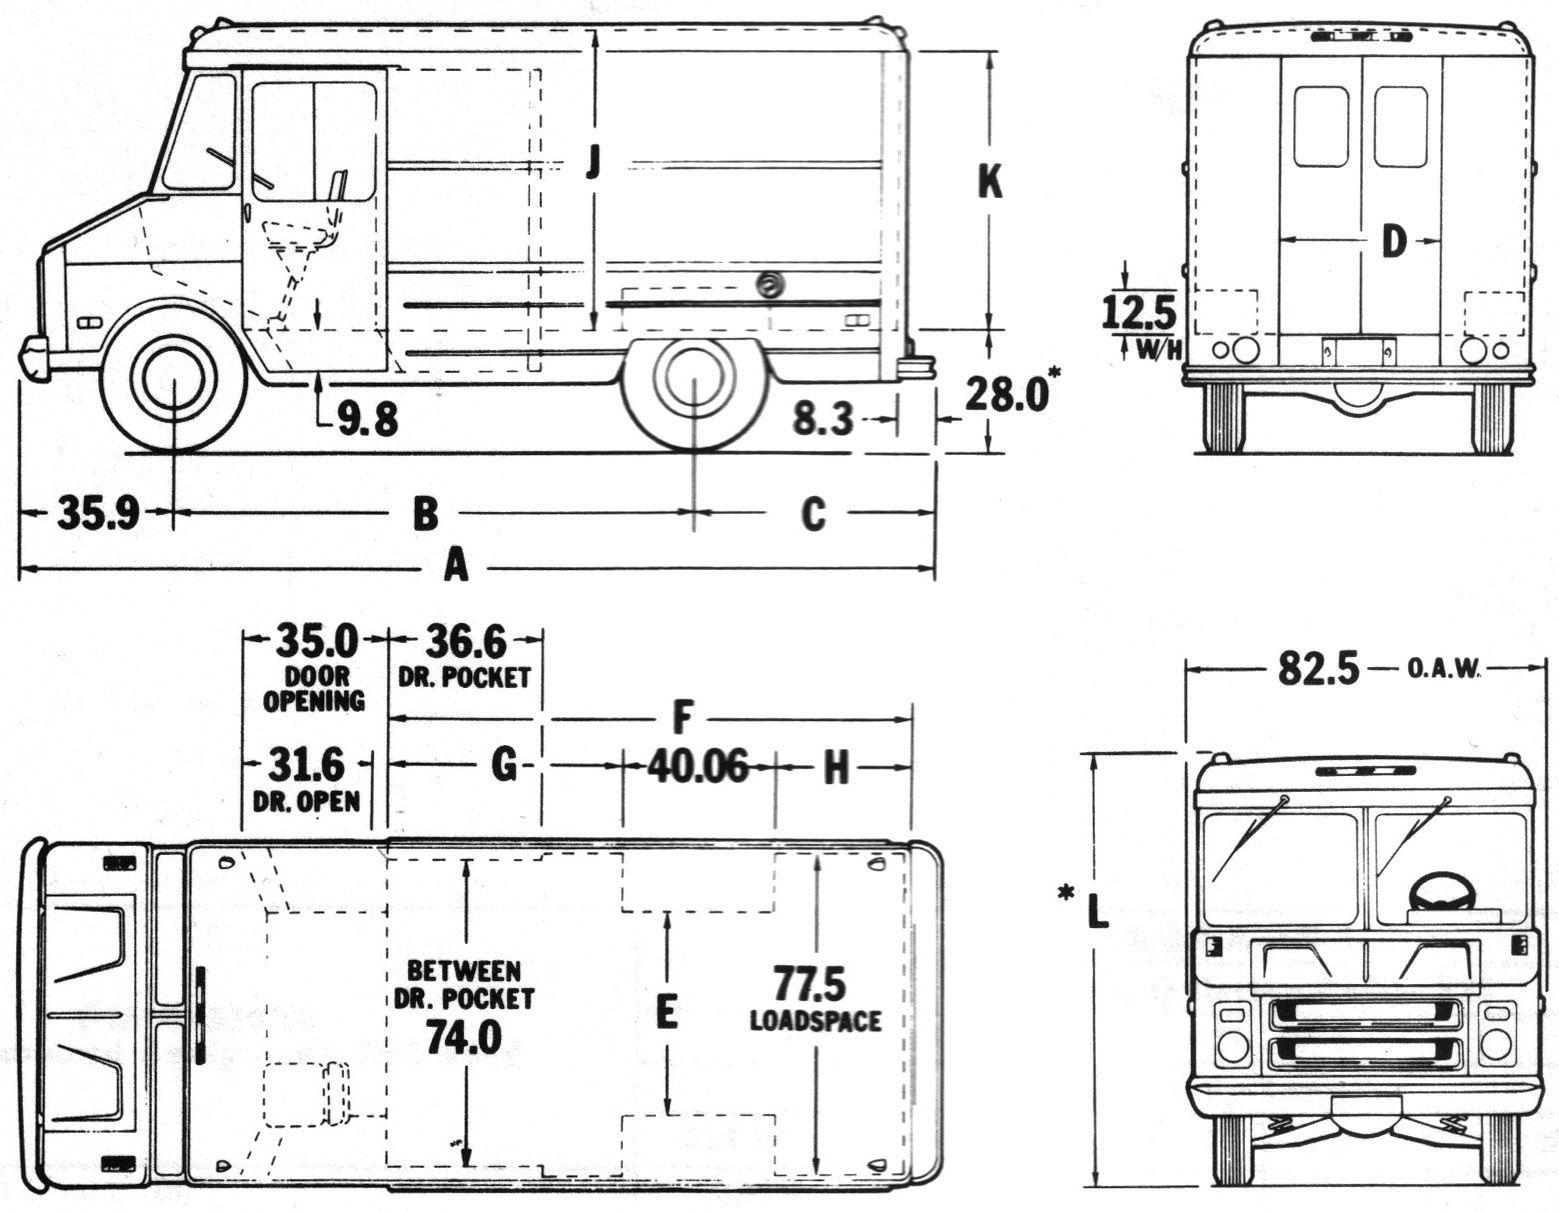 Chevrolet c30 blueprint student project ideas for Food truck blueprints